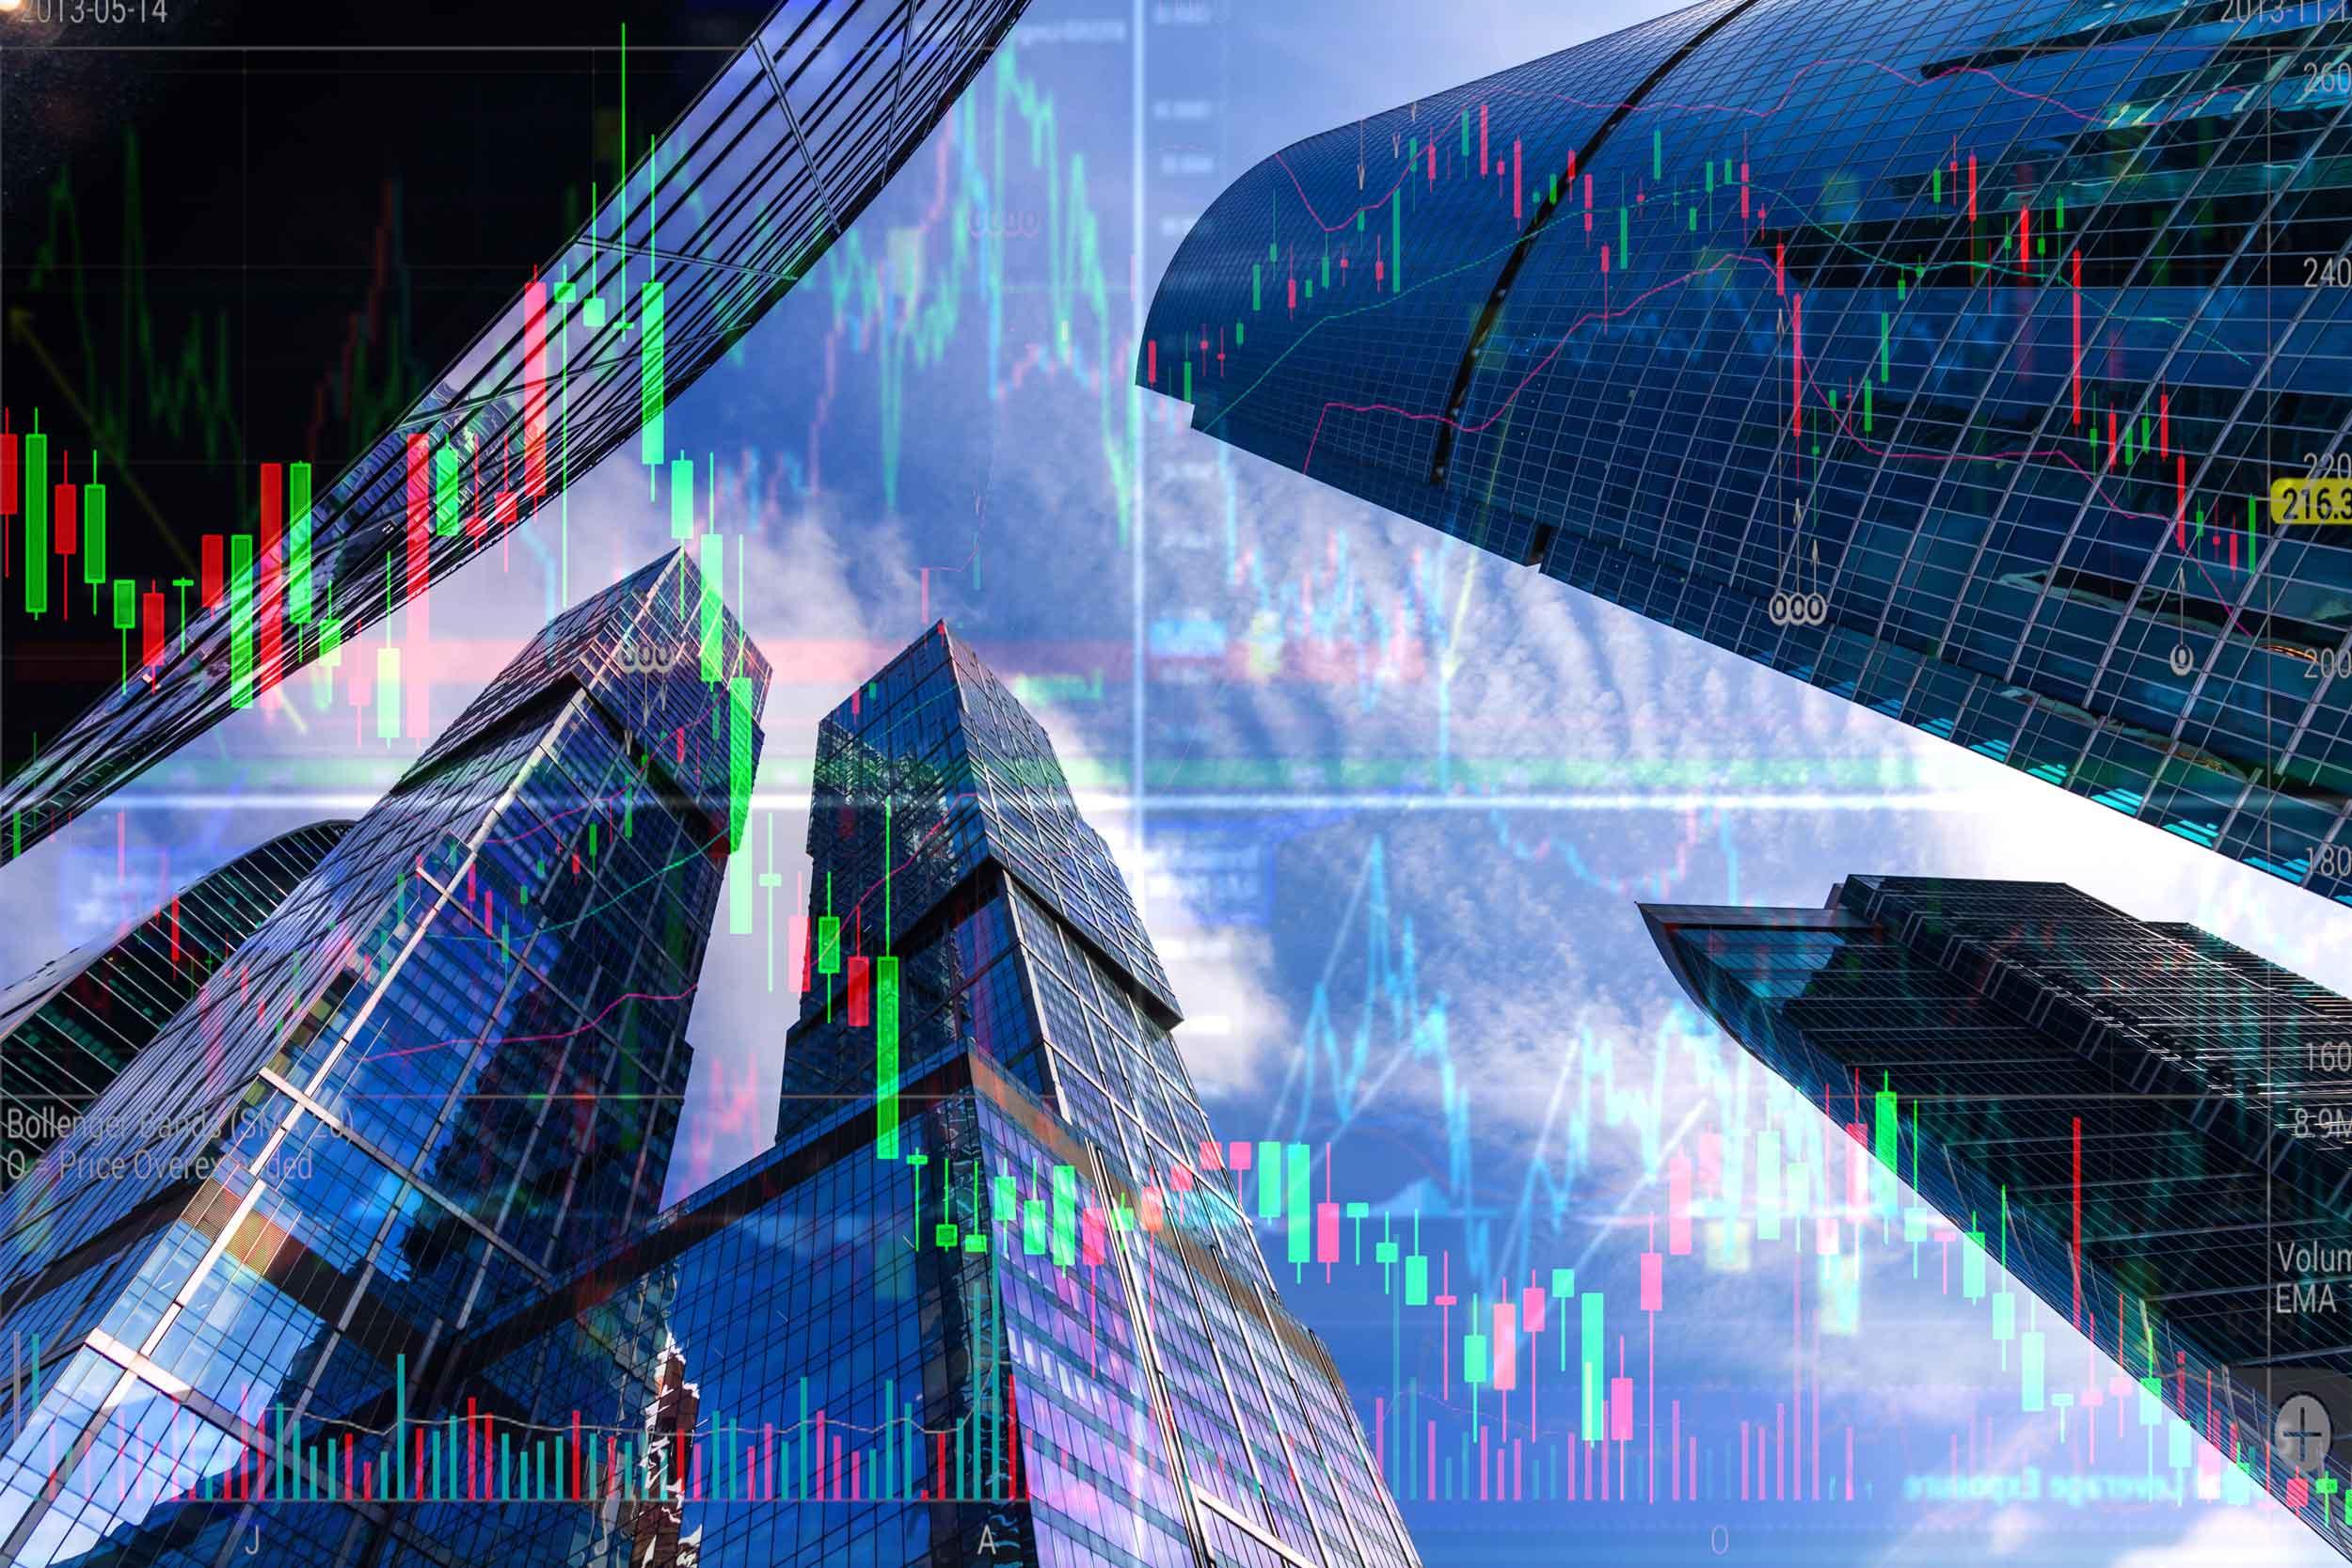 Double exposure image of stock-market in front of skyscrapers